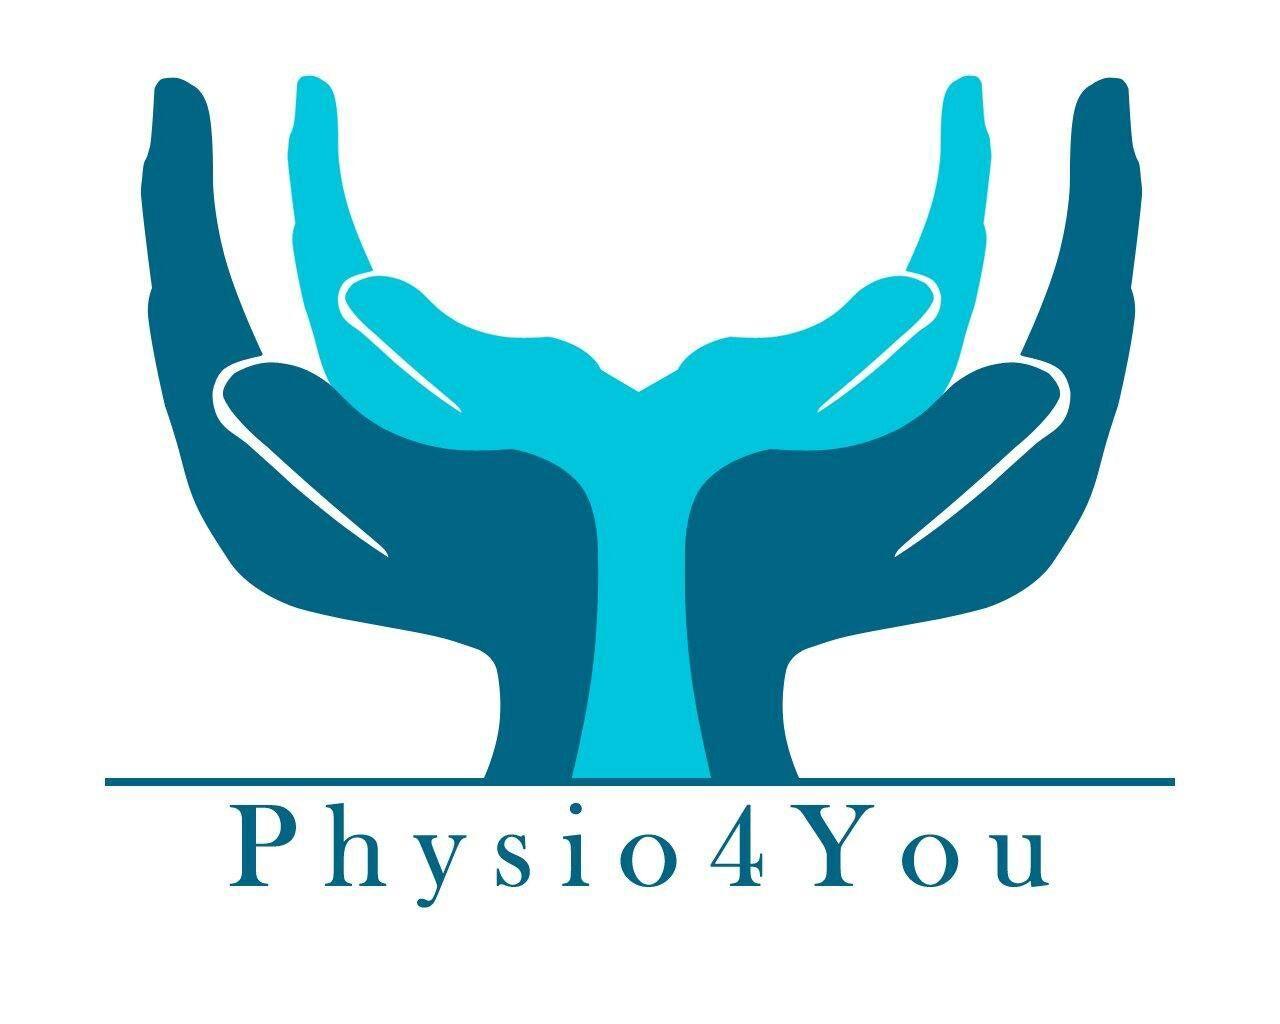 Physio4You